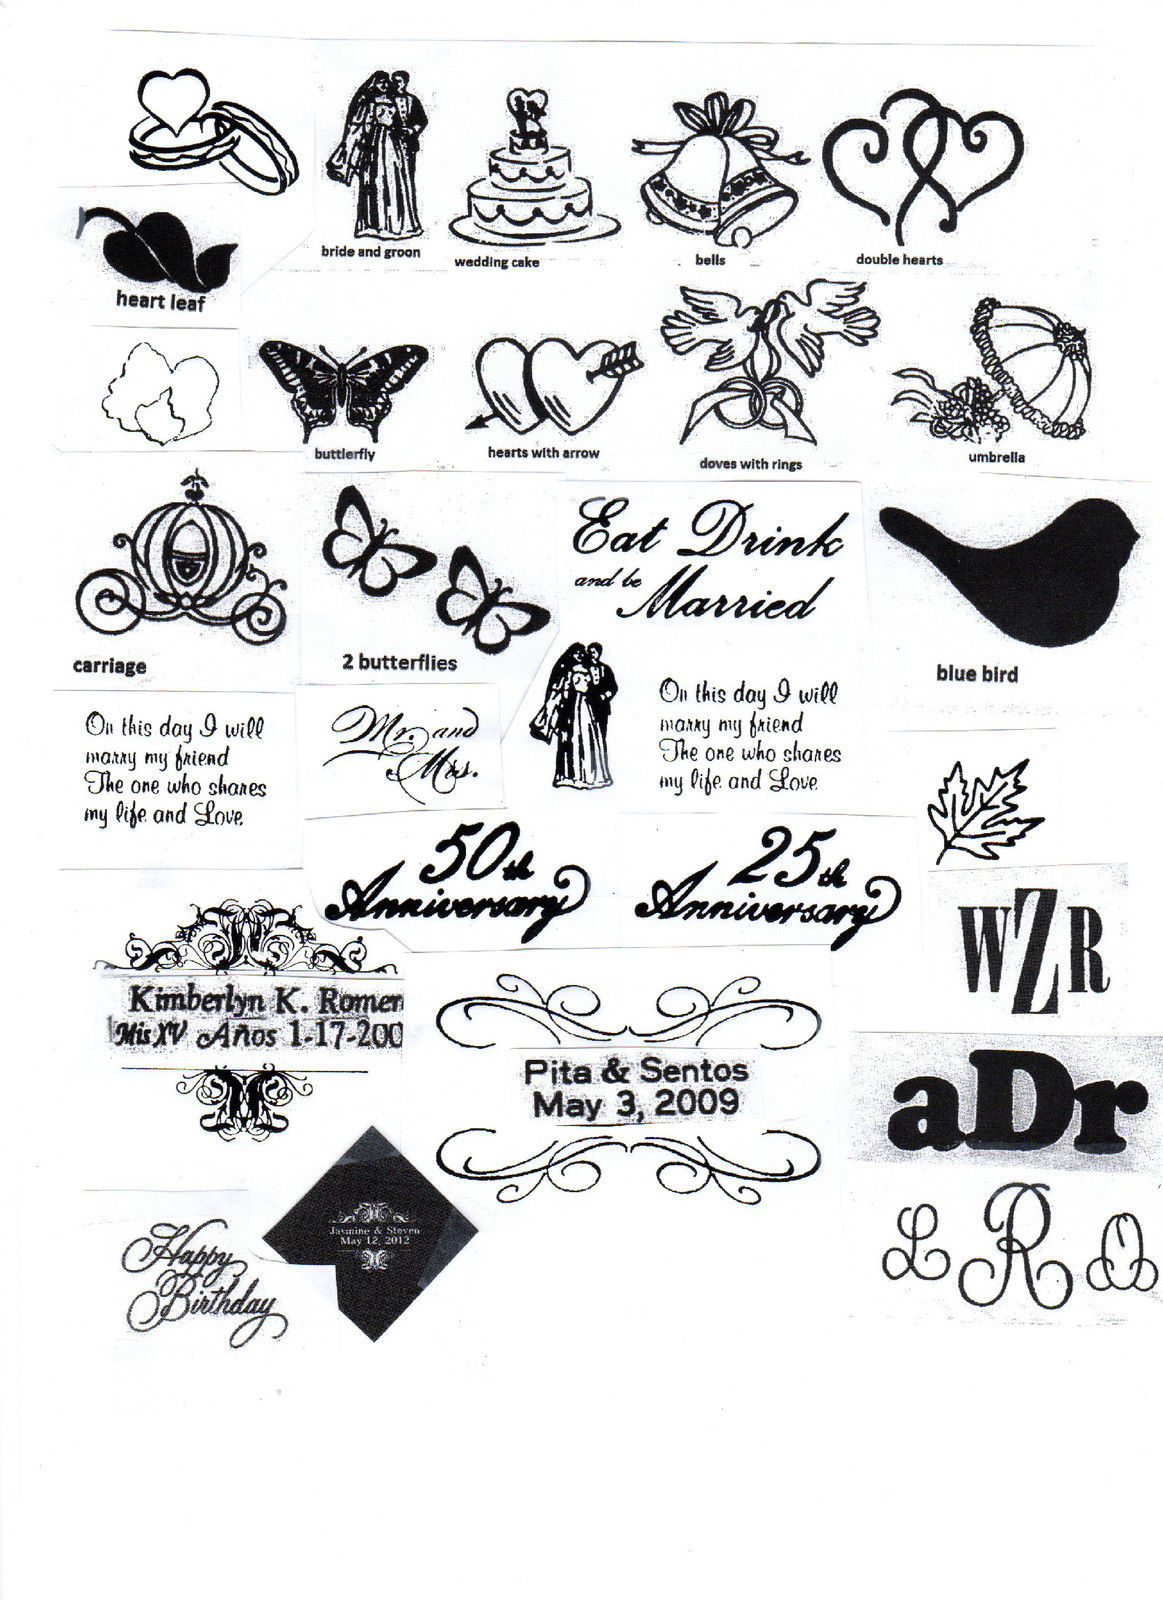 HALLOWEEN SPIDER LOGO 50 Personalized printed cocktail beverage napkins wedding